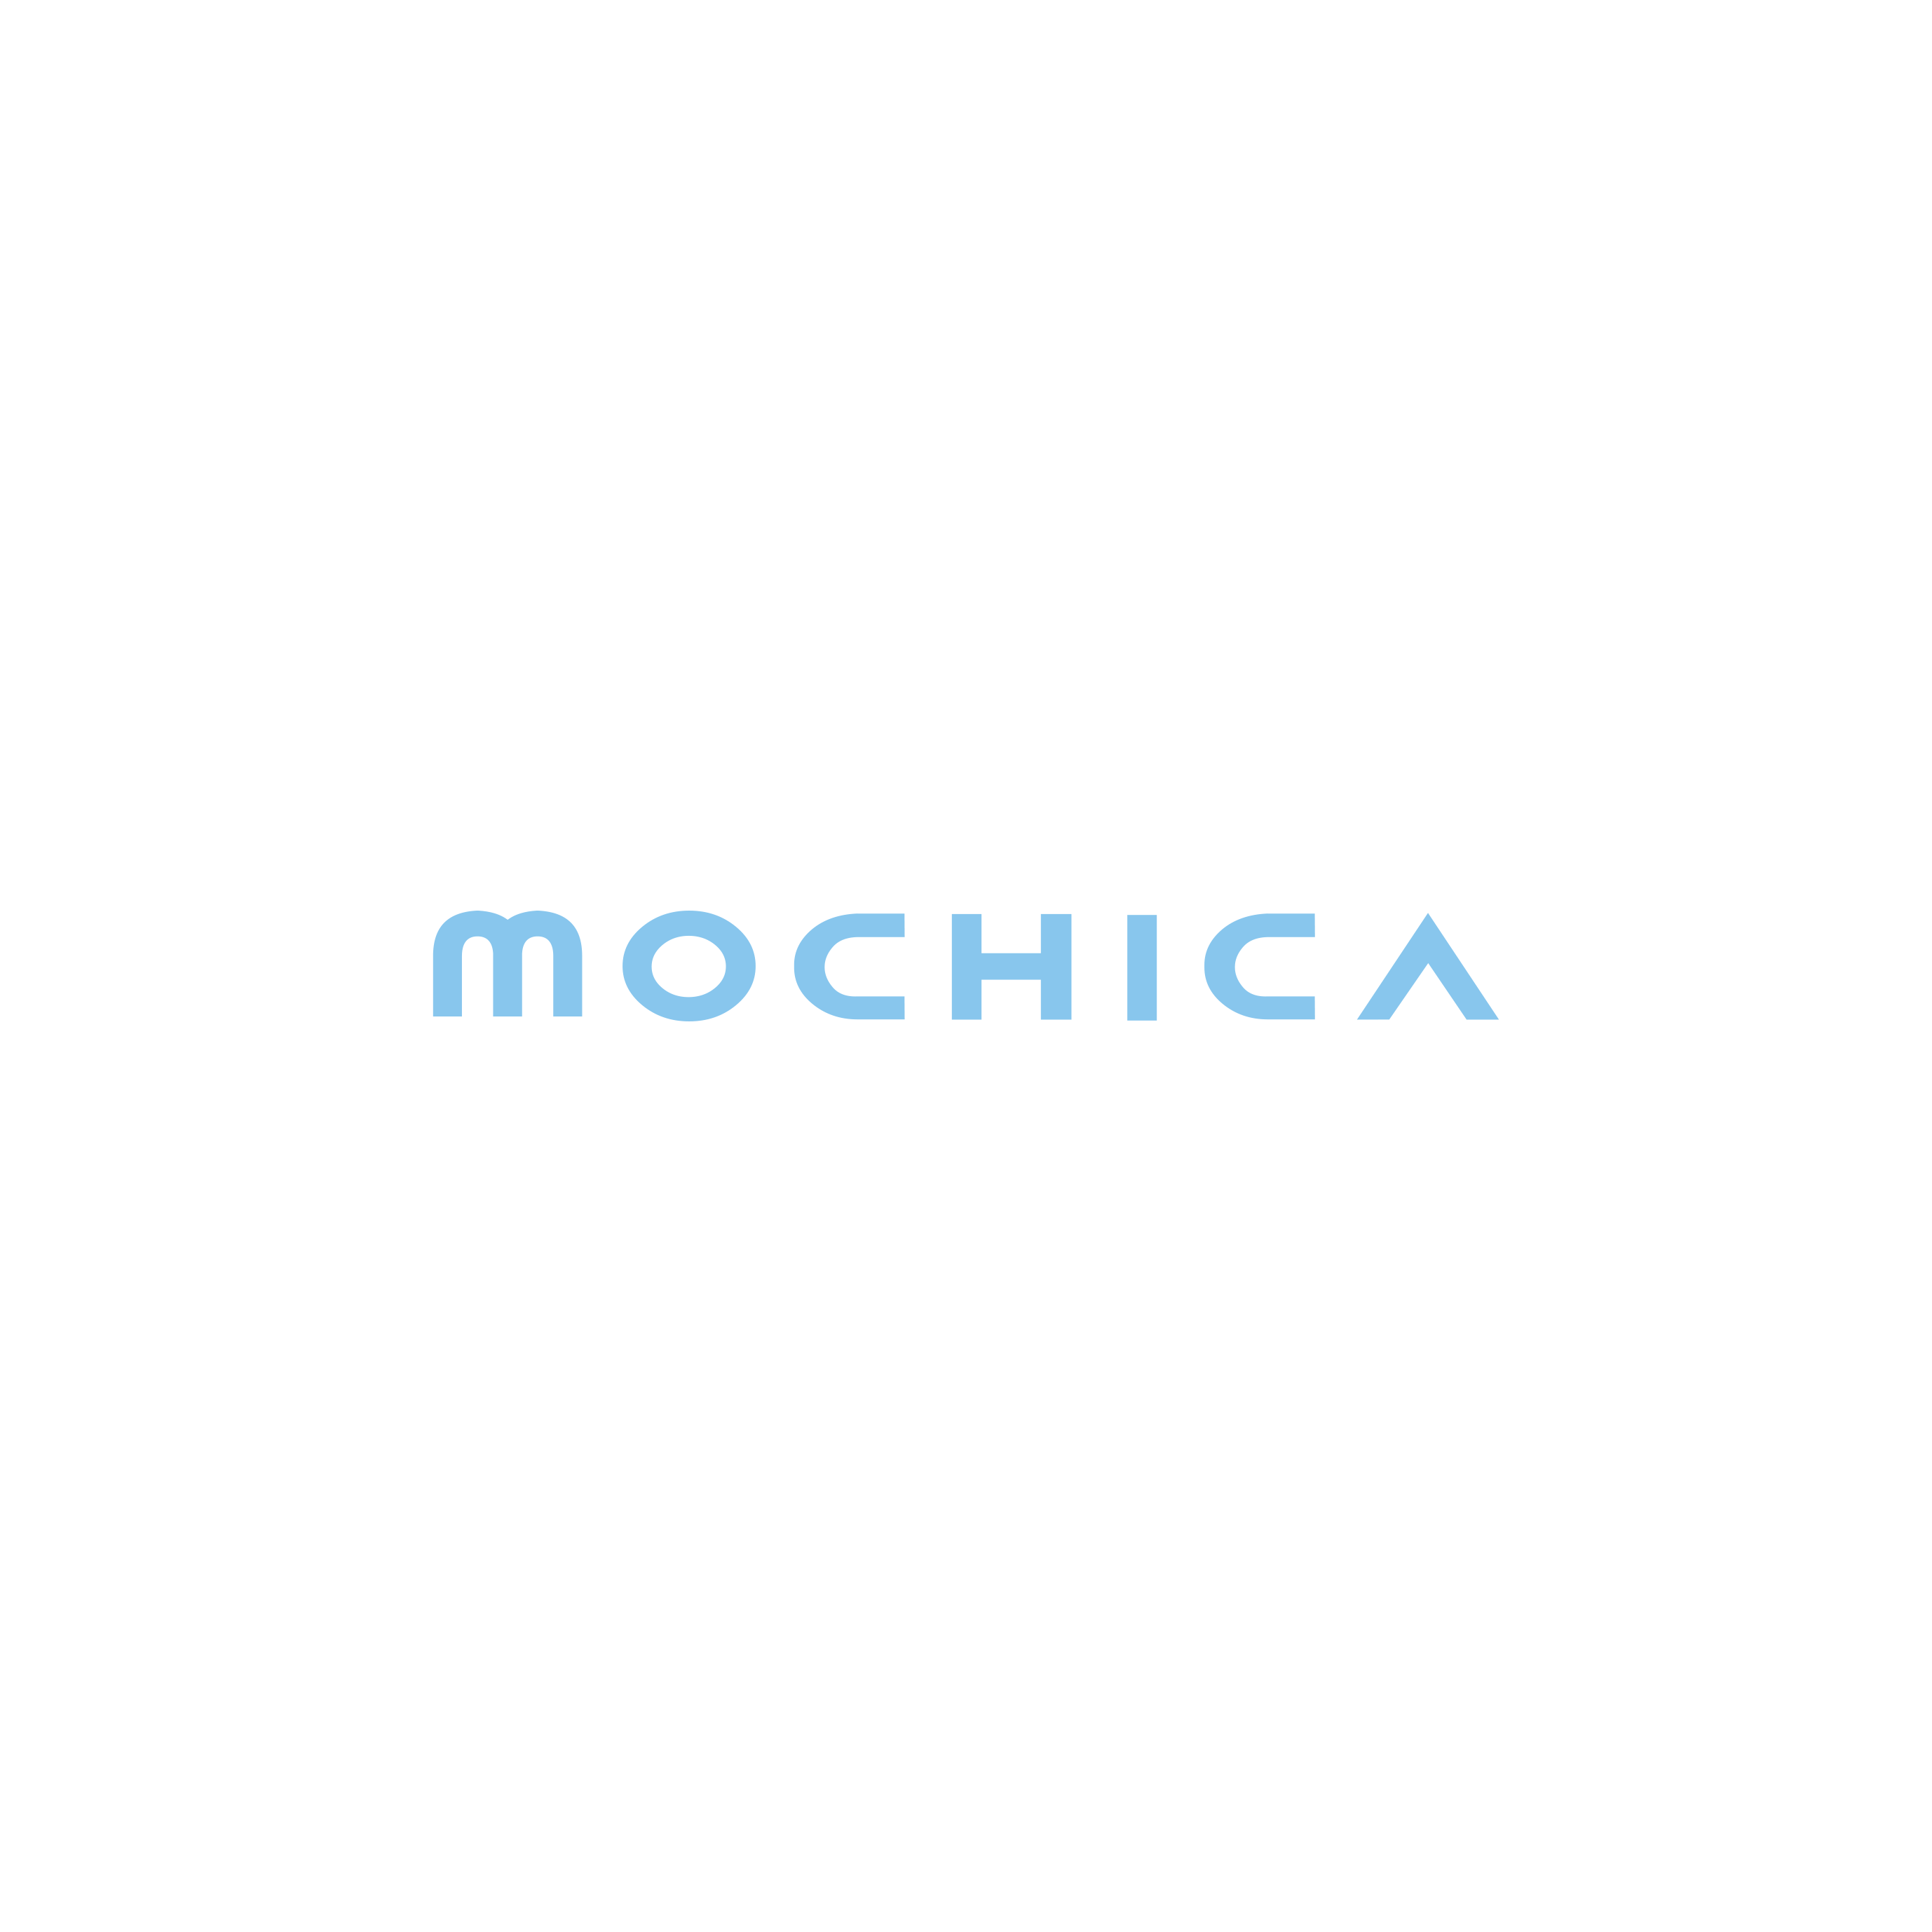 【MOCHICA統括】LINEと連携した新卒採用ツール『MOCHICA(モチカ)』セールス